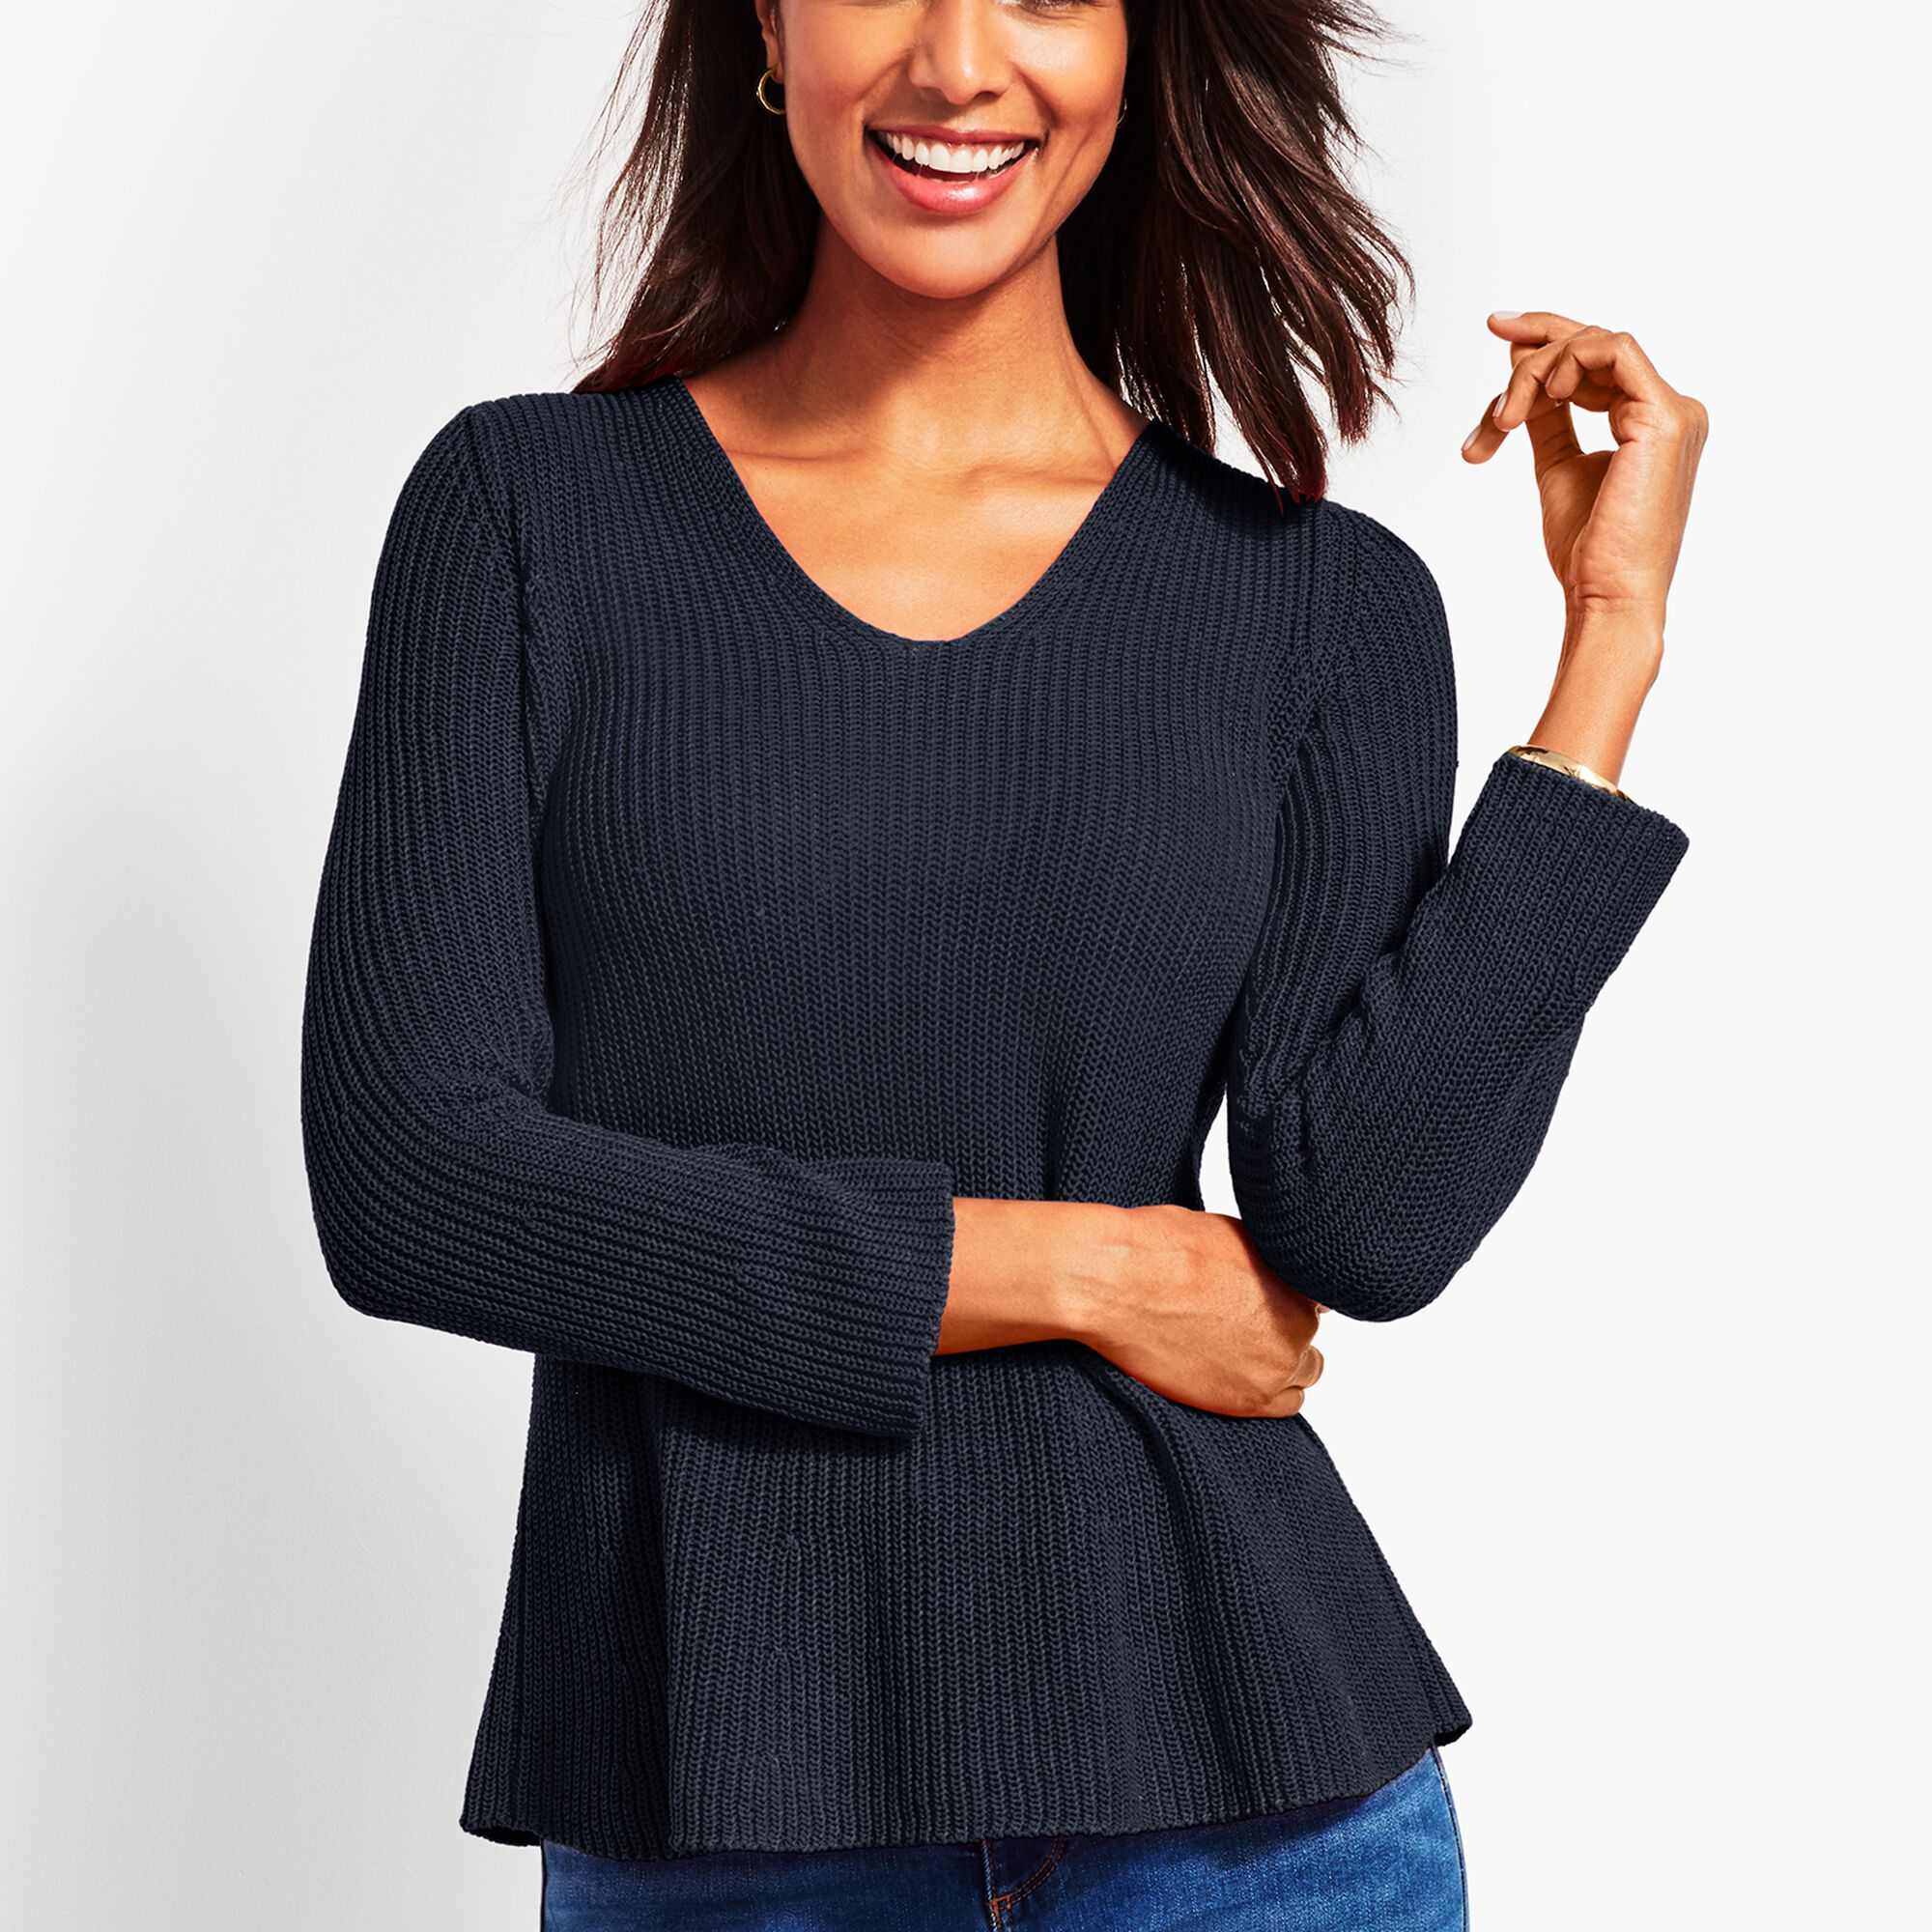 08dd9f250361 Shaker-Stitch Flounce Sweater